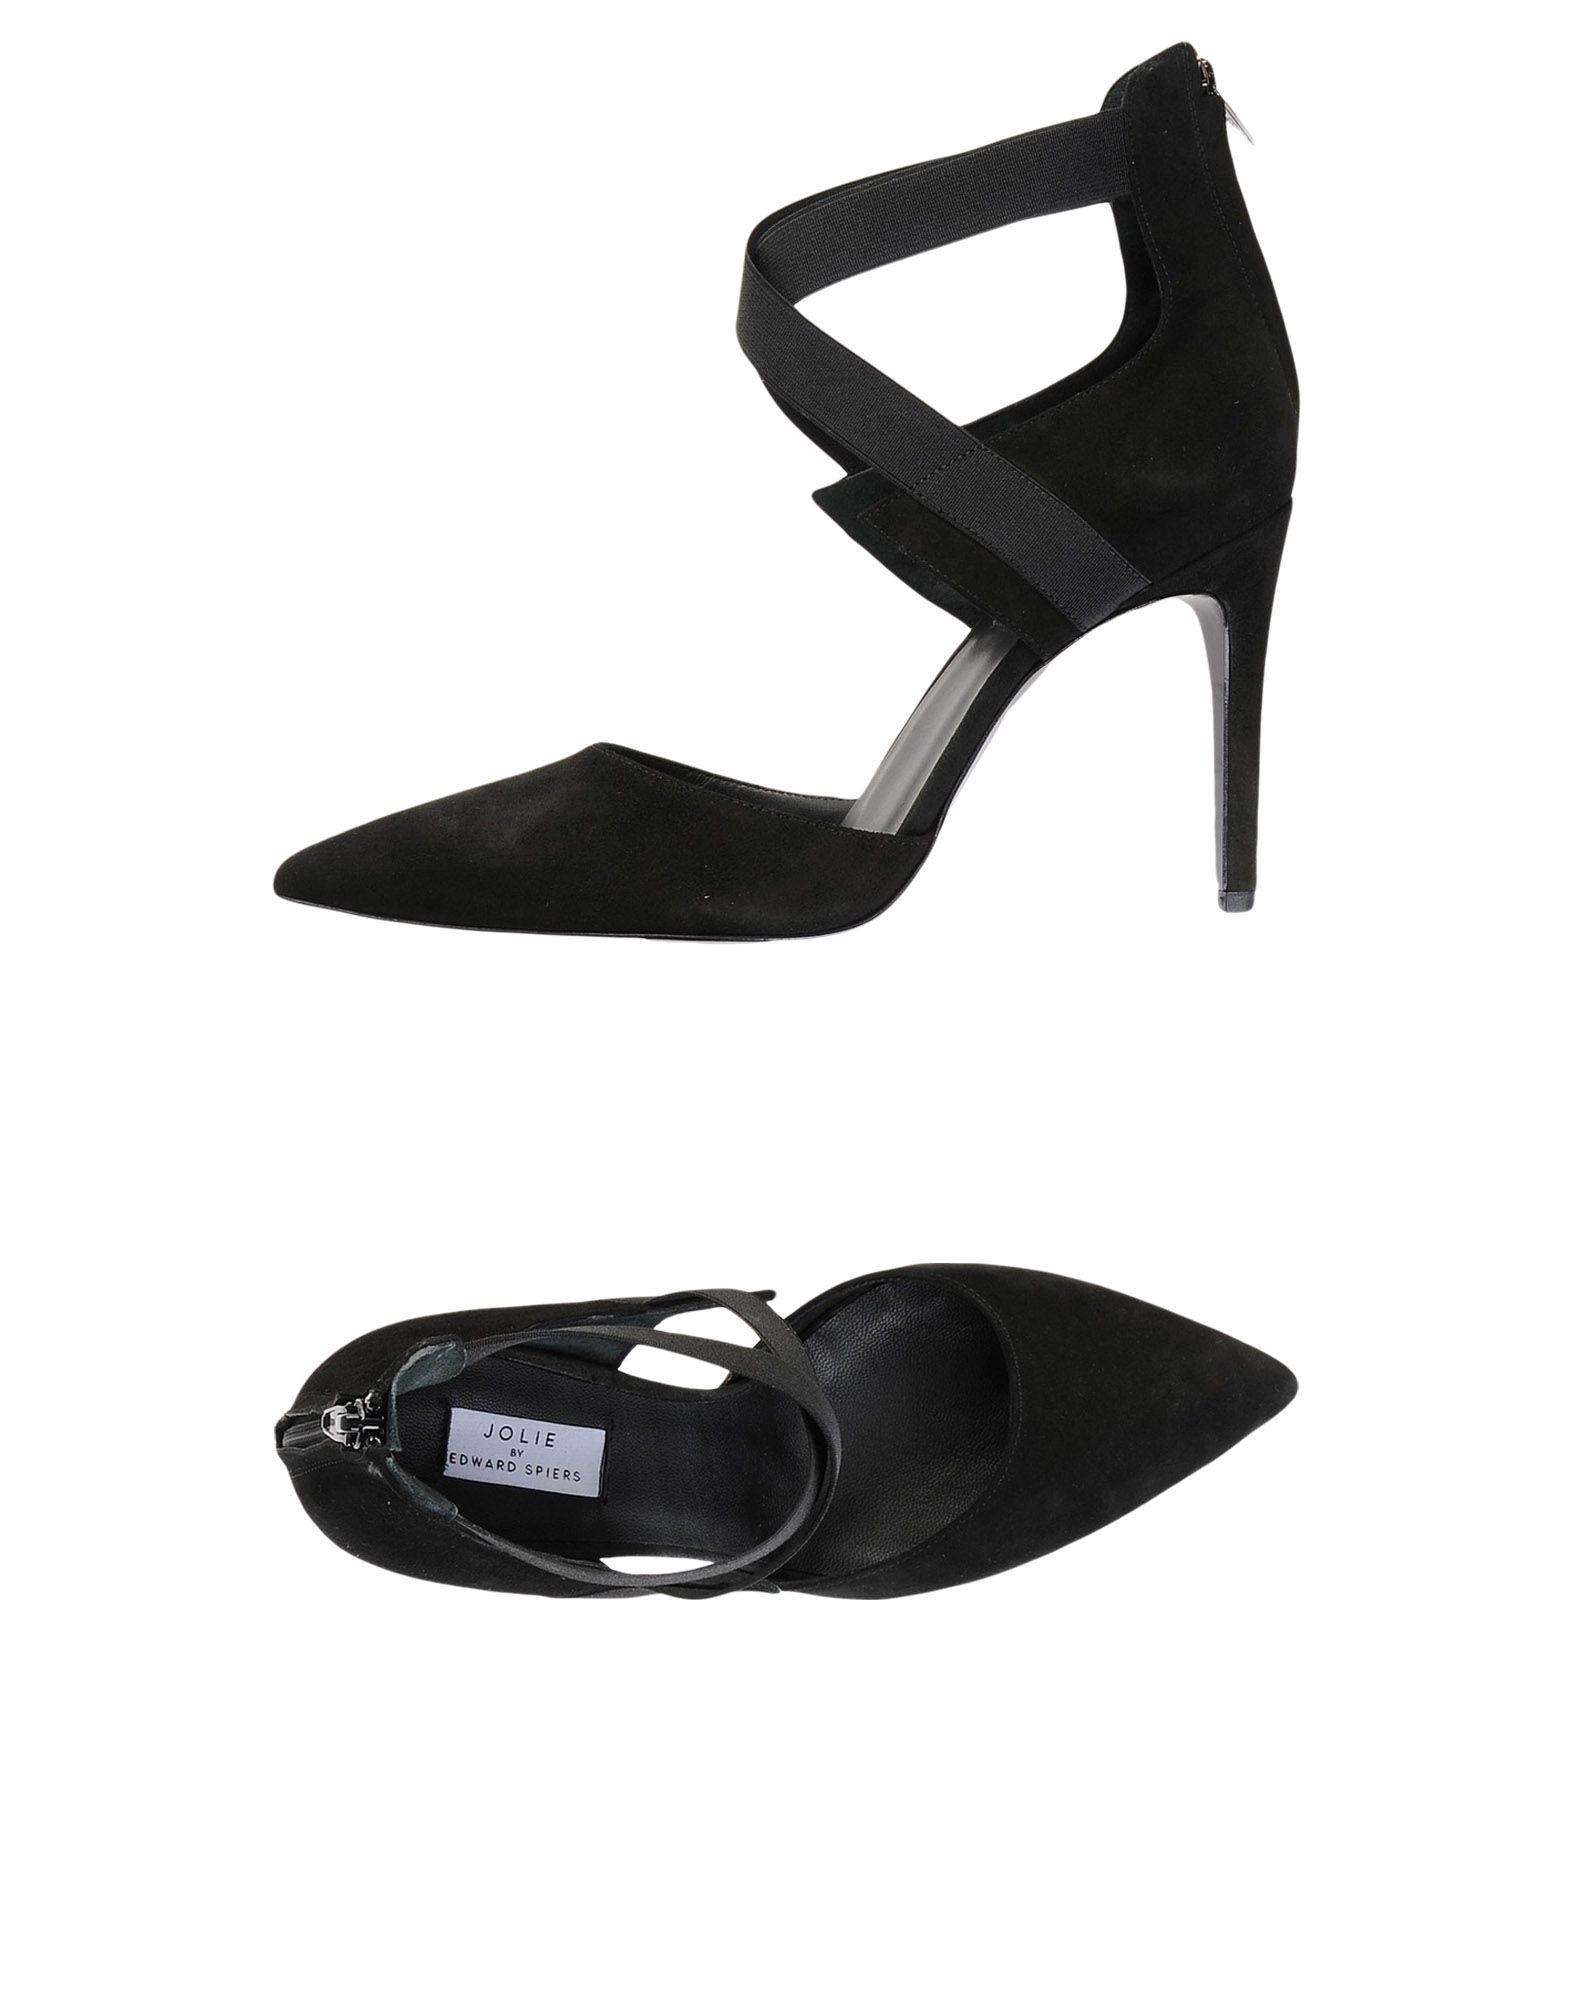 Jolie By Schuhe Edward Spiers Pumps Damen  11535485AN Heiße Schuhe By 1ec329